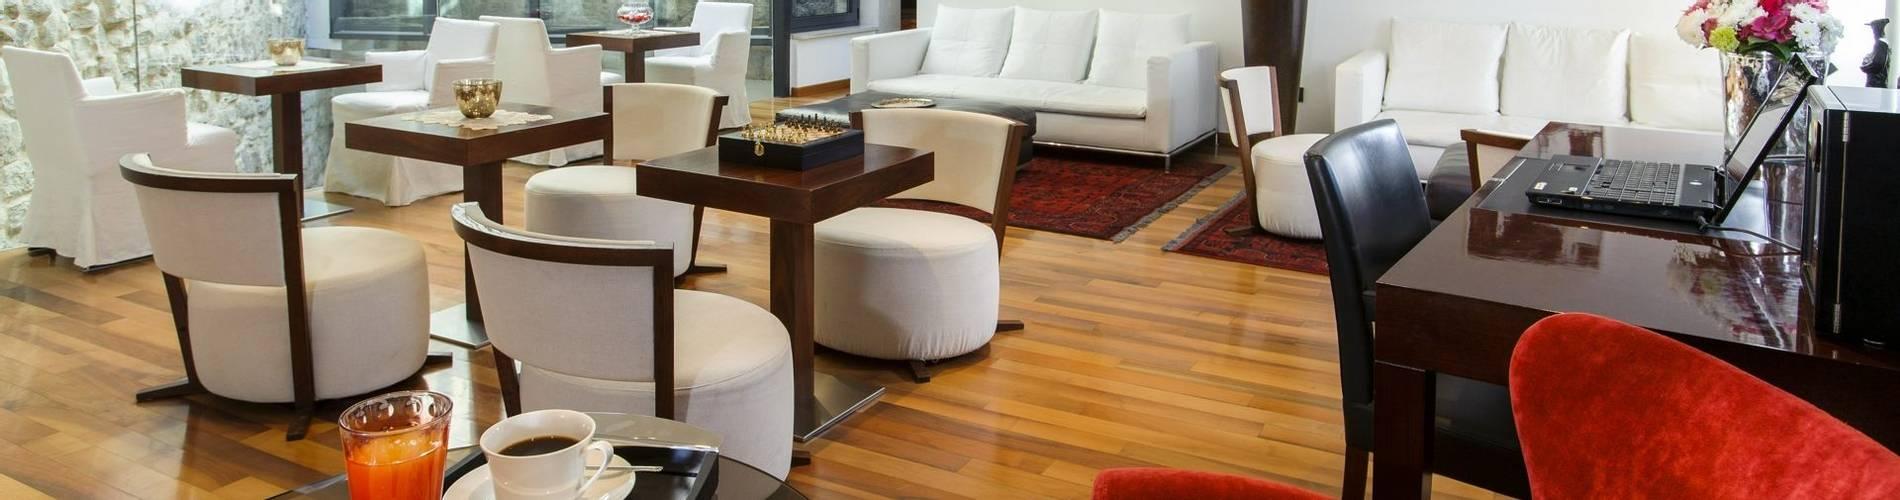 Residents-Lounge-Heritage-Marmont-Completely-Croatia.jpg